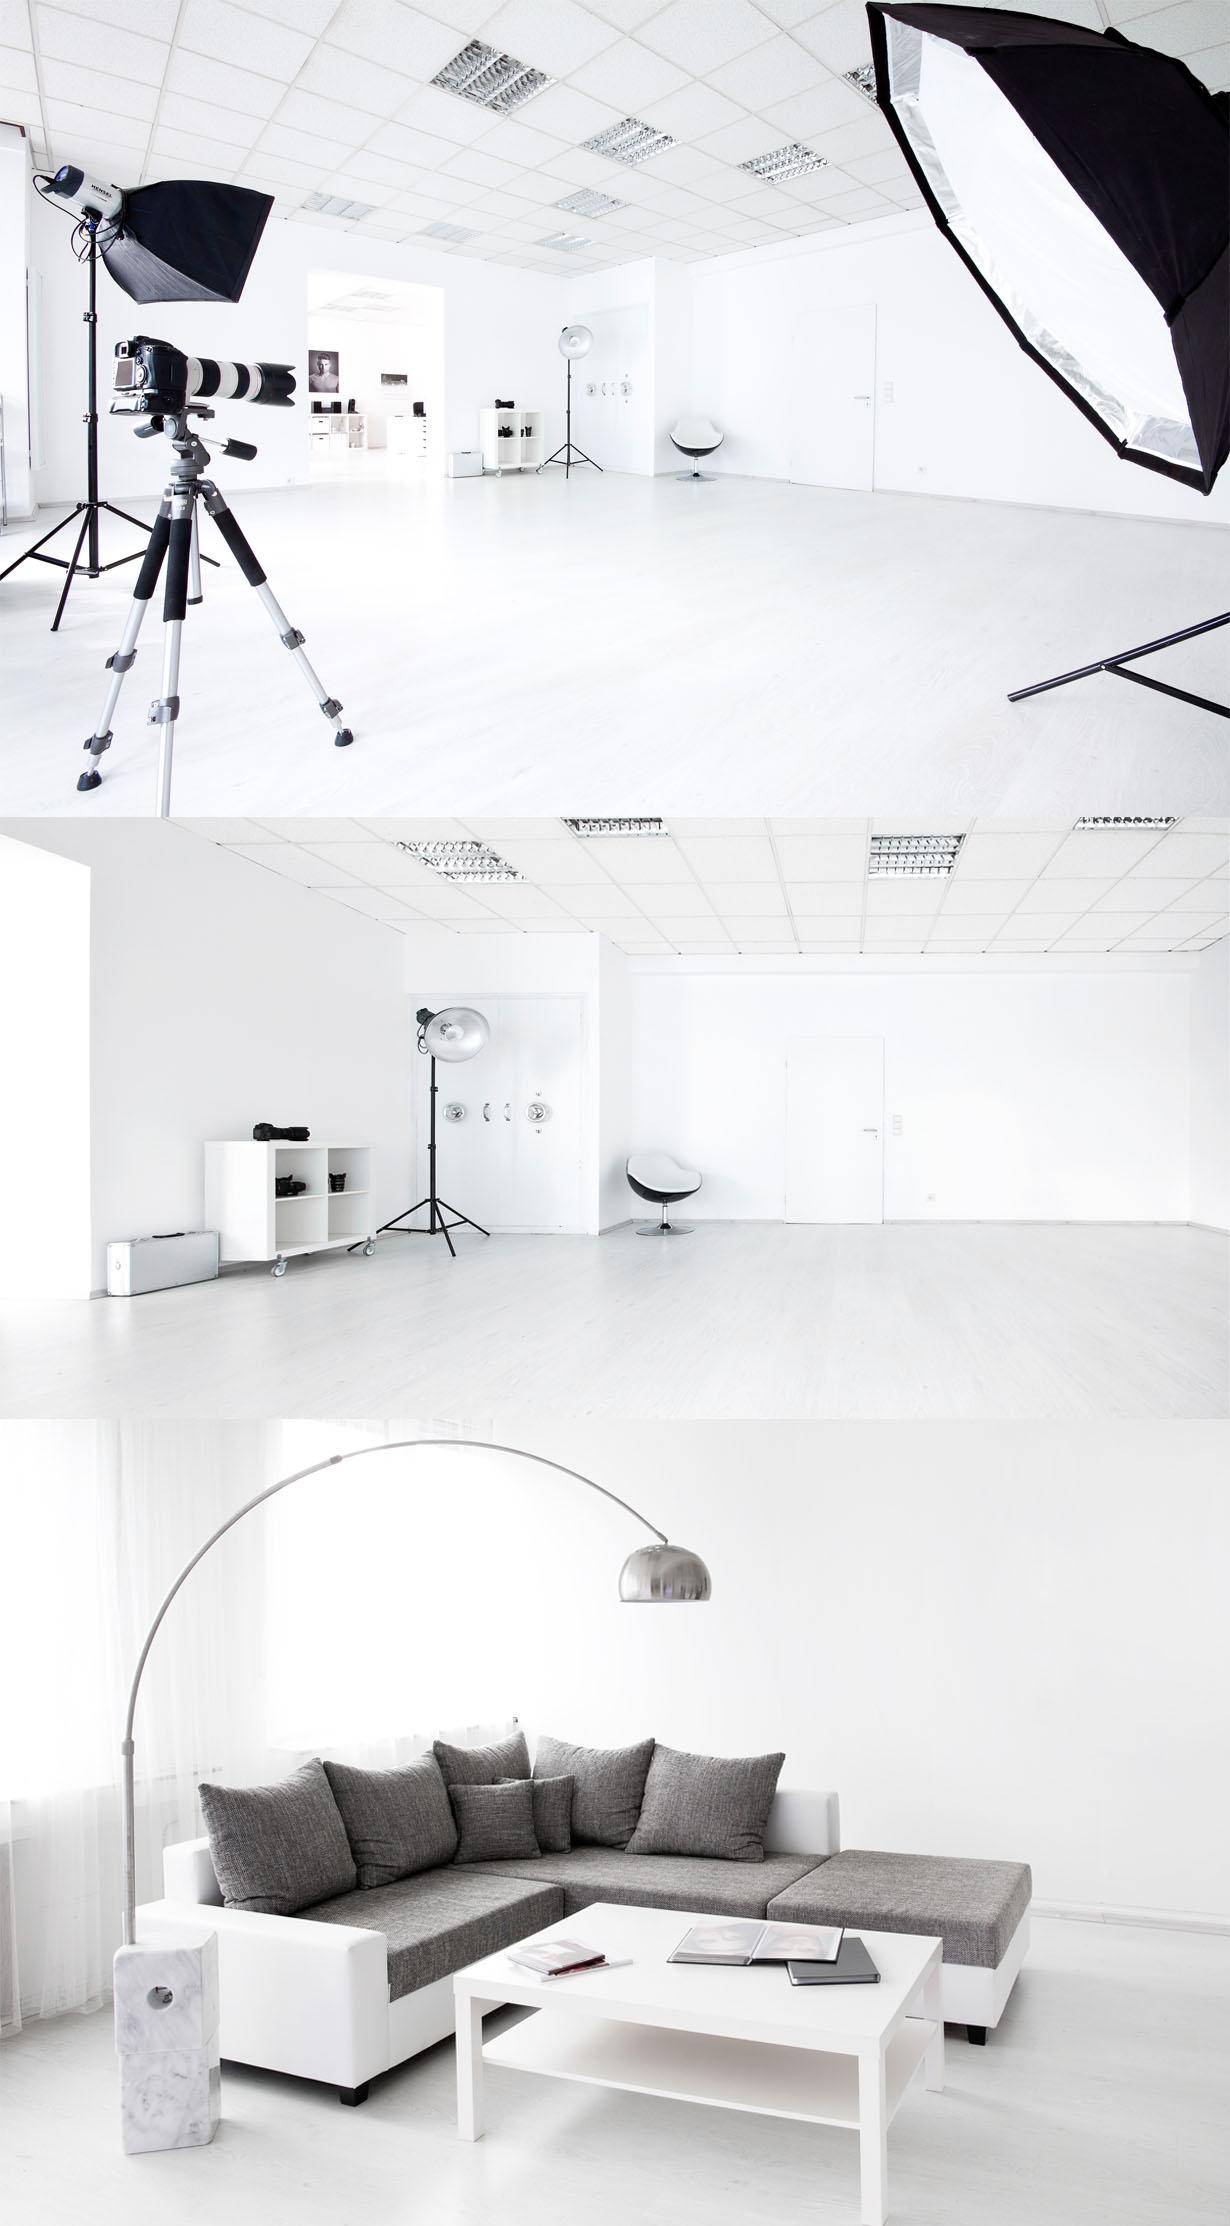 das fotostudio prepixel in m nster fotograf timo b hring fotostudio prepixel m nster. Black Bedroom Furniture Sets. Home Design Ideas